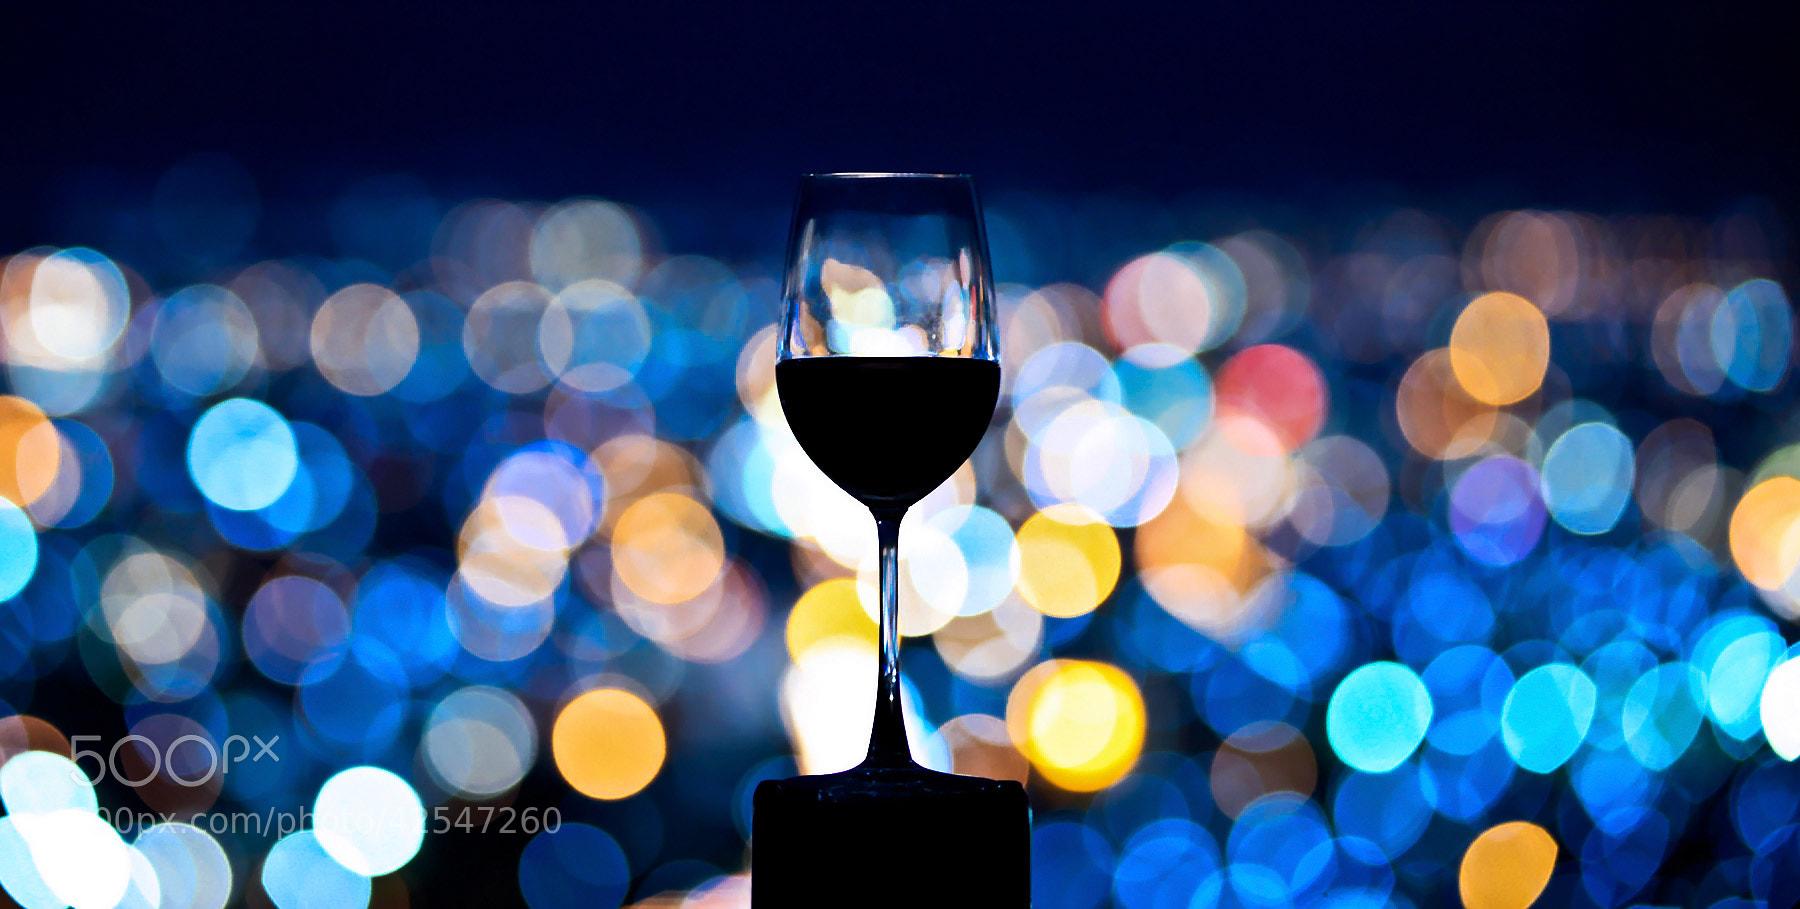 Photograph Let's Celebrate by Guy HIGHLANDER on 500px